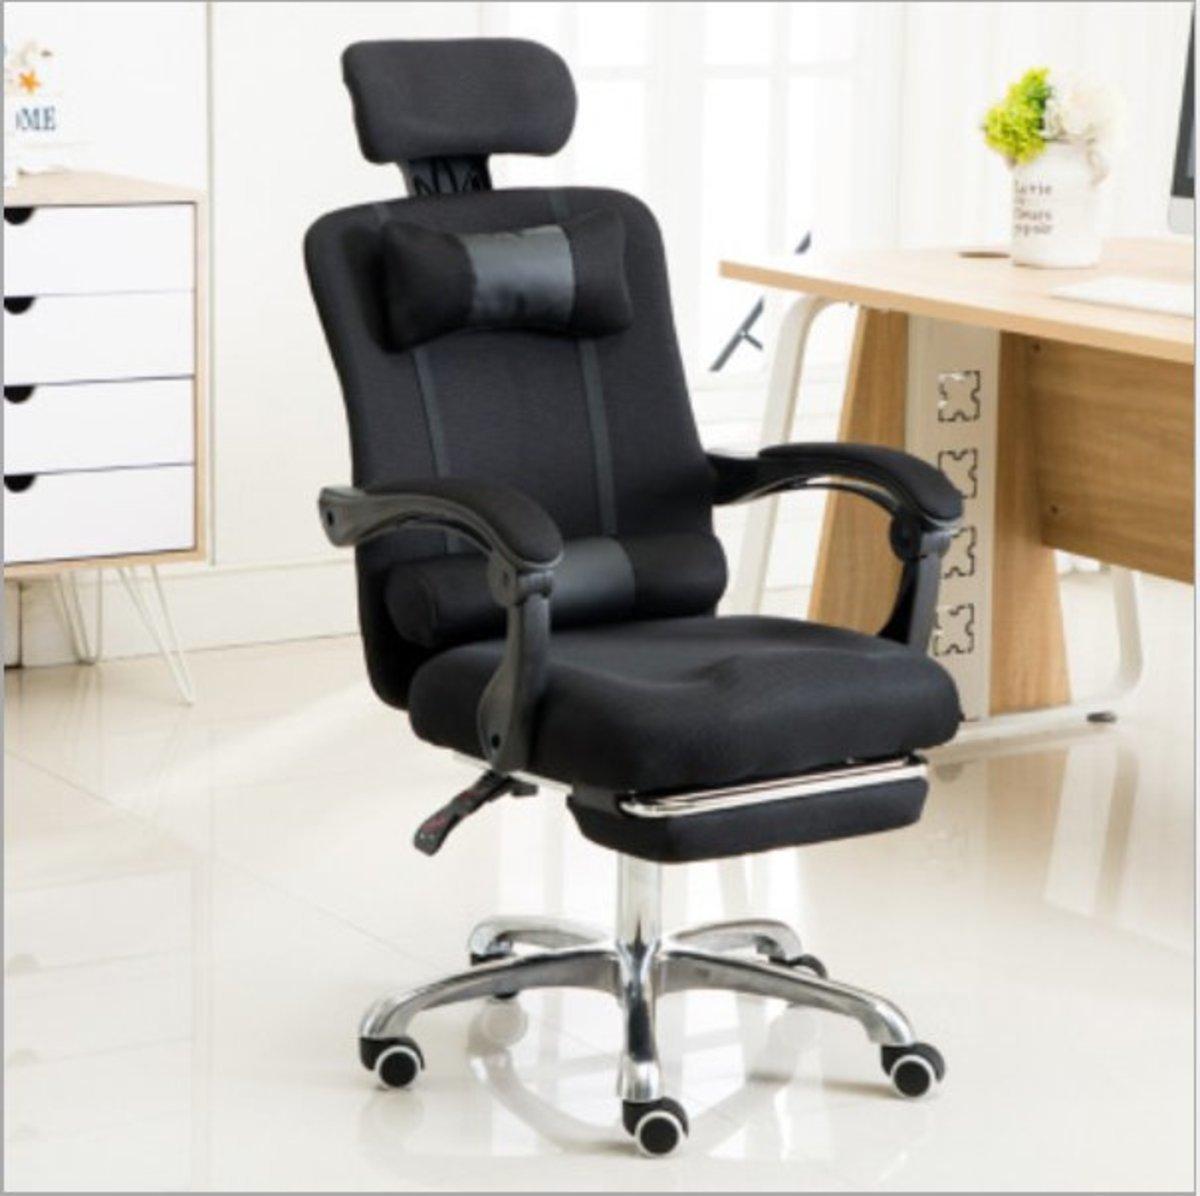 Ergonomic Liftable Computer Office Chair - Black